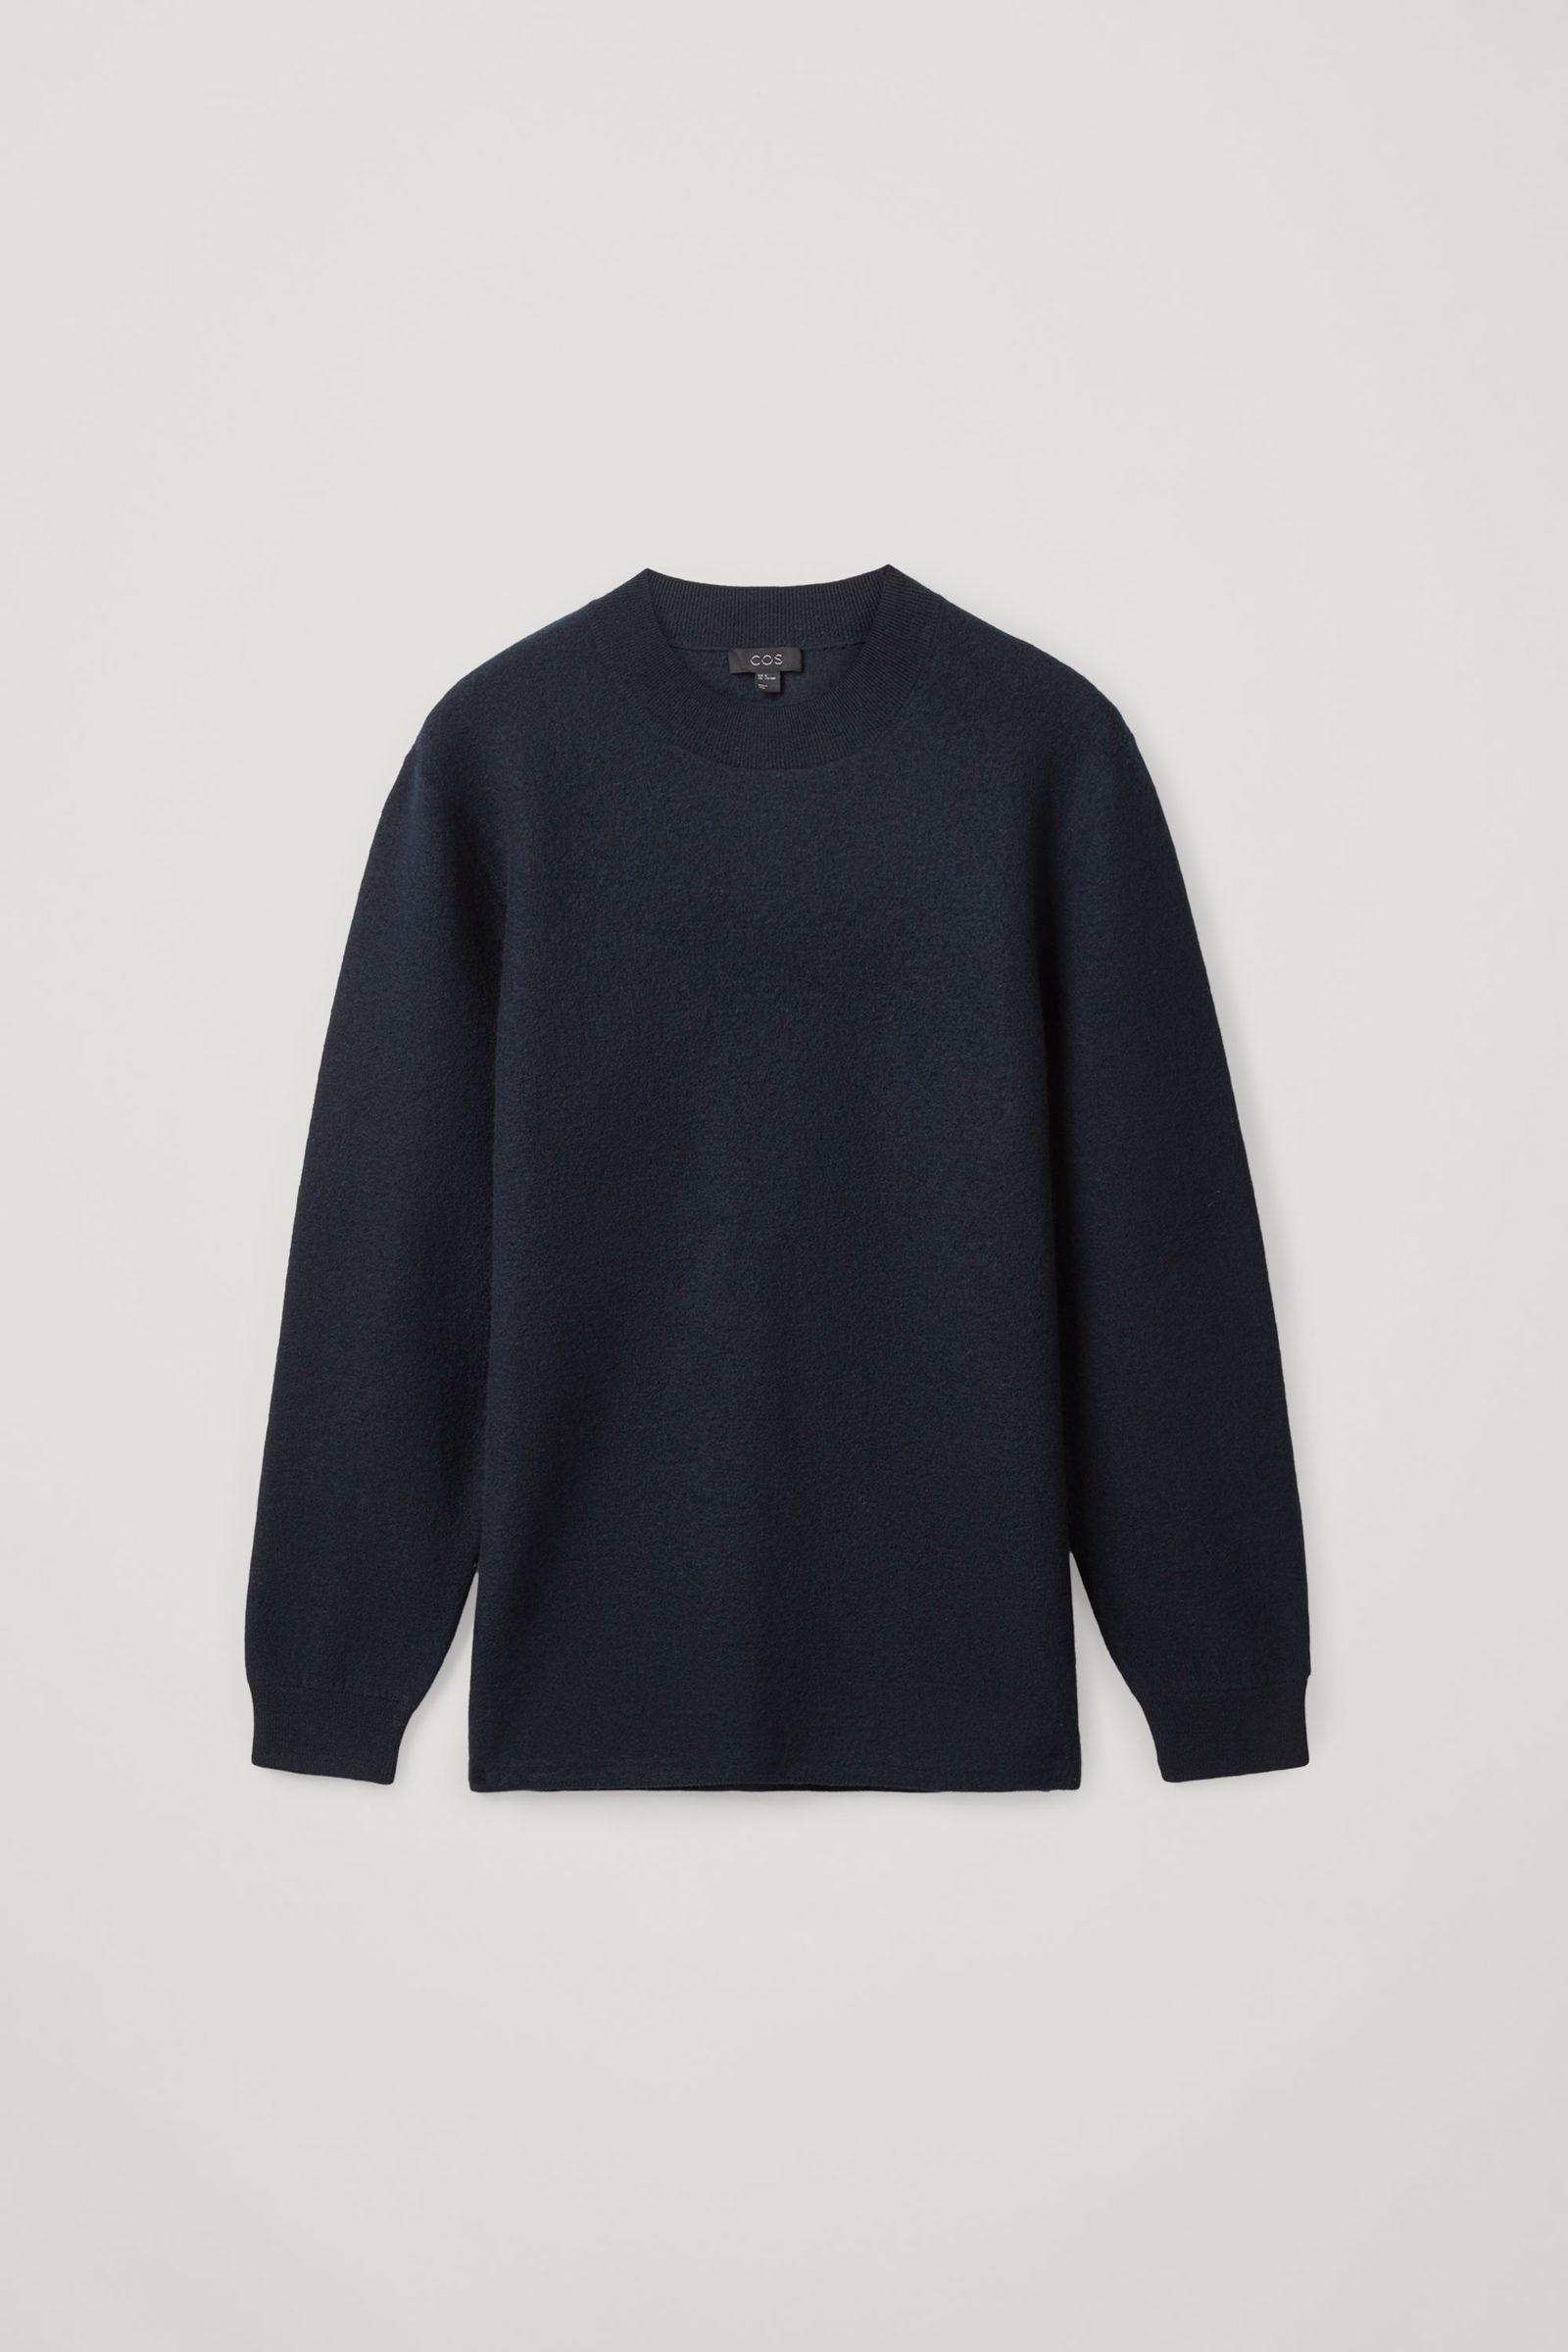 COS 레더 디테일 메리노 울 스웨터의 네이비컬러 Product입니다.